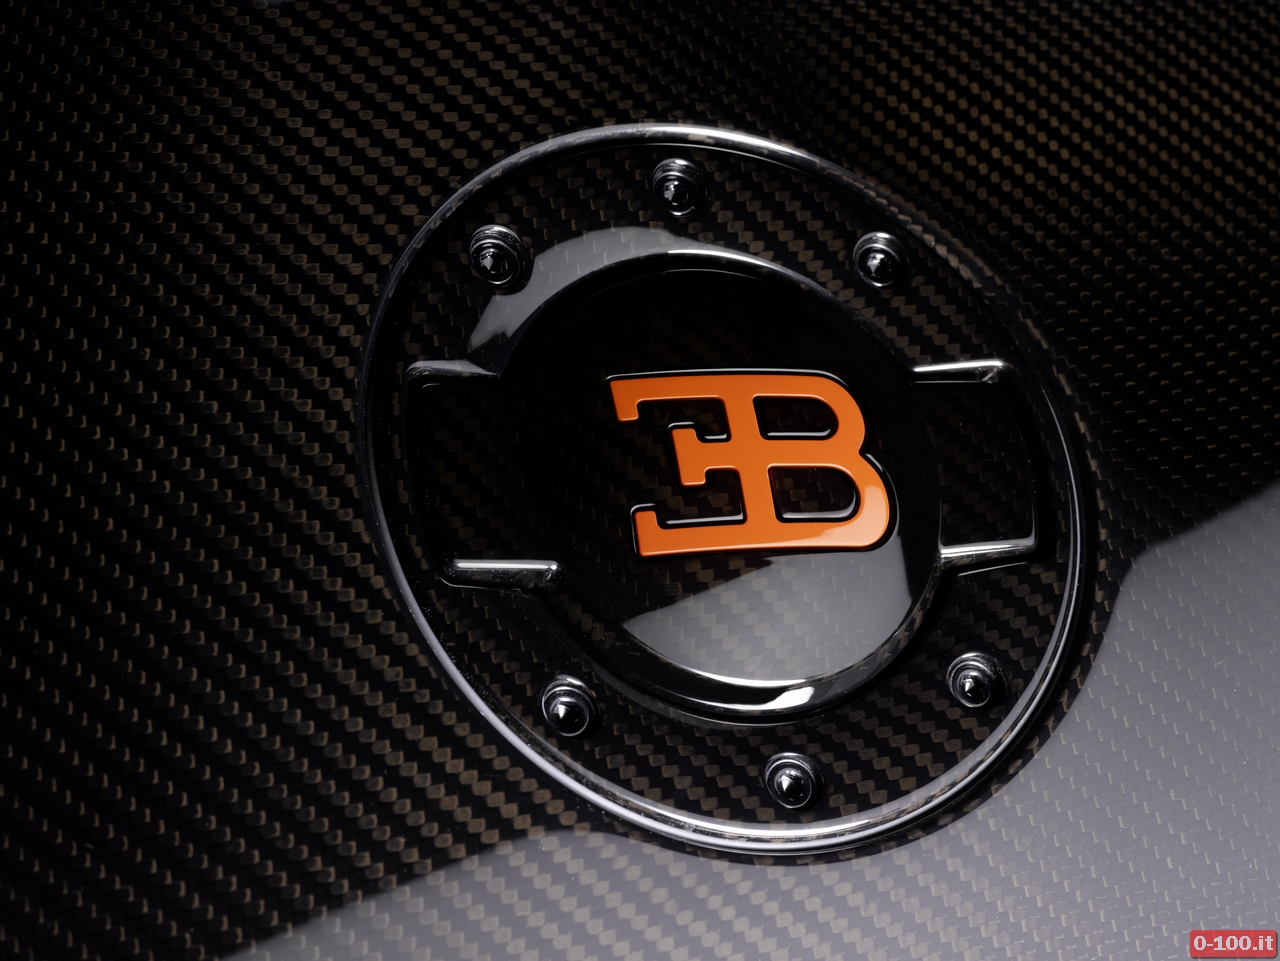 bugatti-veyron-16-4-grand-sport-vitesse-debutto-a-shanghai_0-100_8